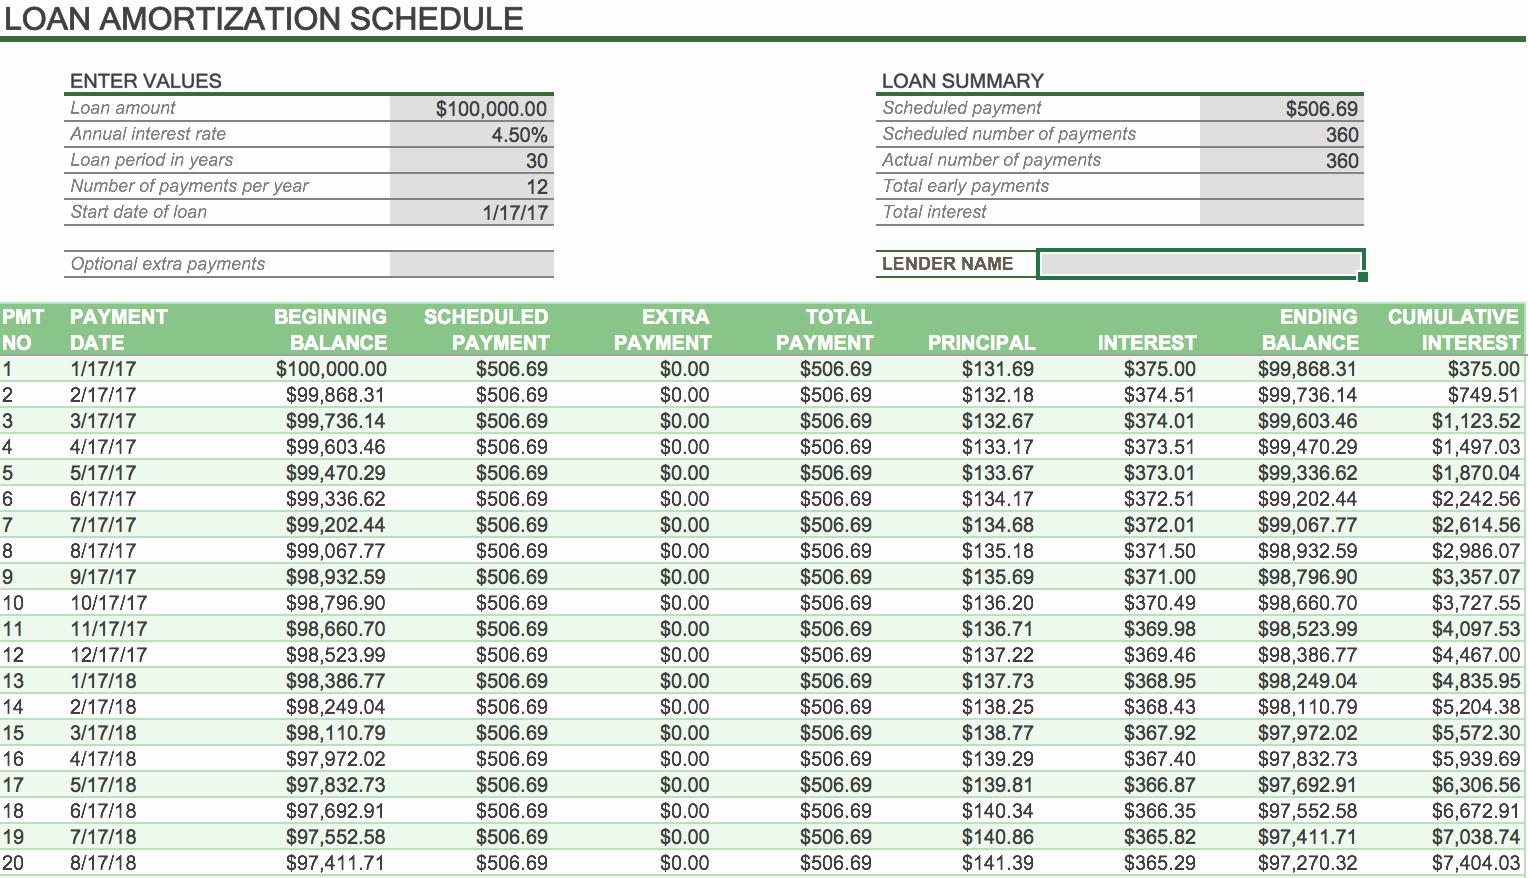 Mortgage Interest Amortization Schedule Excel Best Of Excel Loan Amortization Schedule with Extra Principal